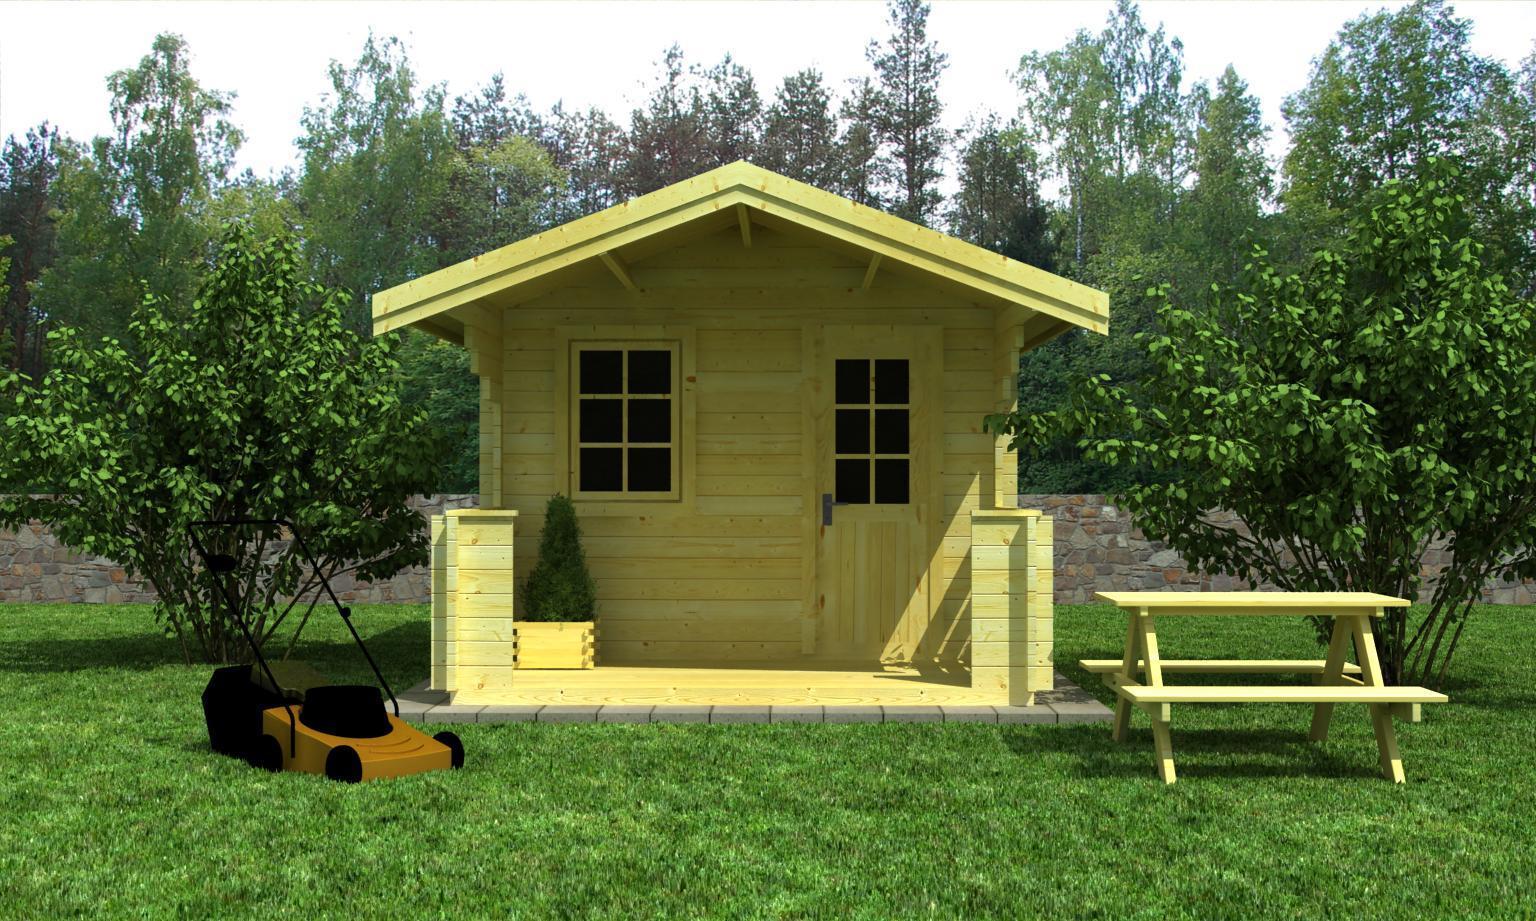 gartenhaus modell paderborn 44 sams gartenhaus shop. Black Bedroom Furniture Sets. Home Design Ideas